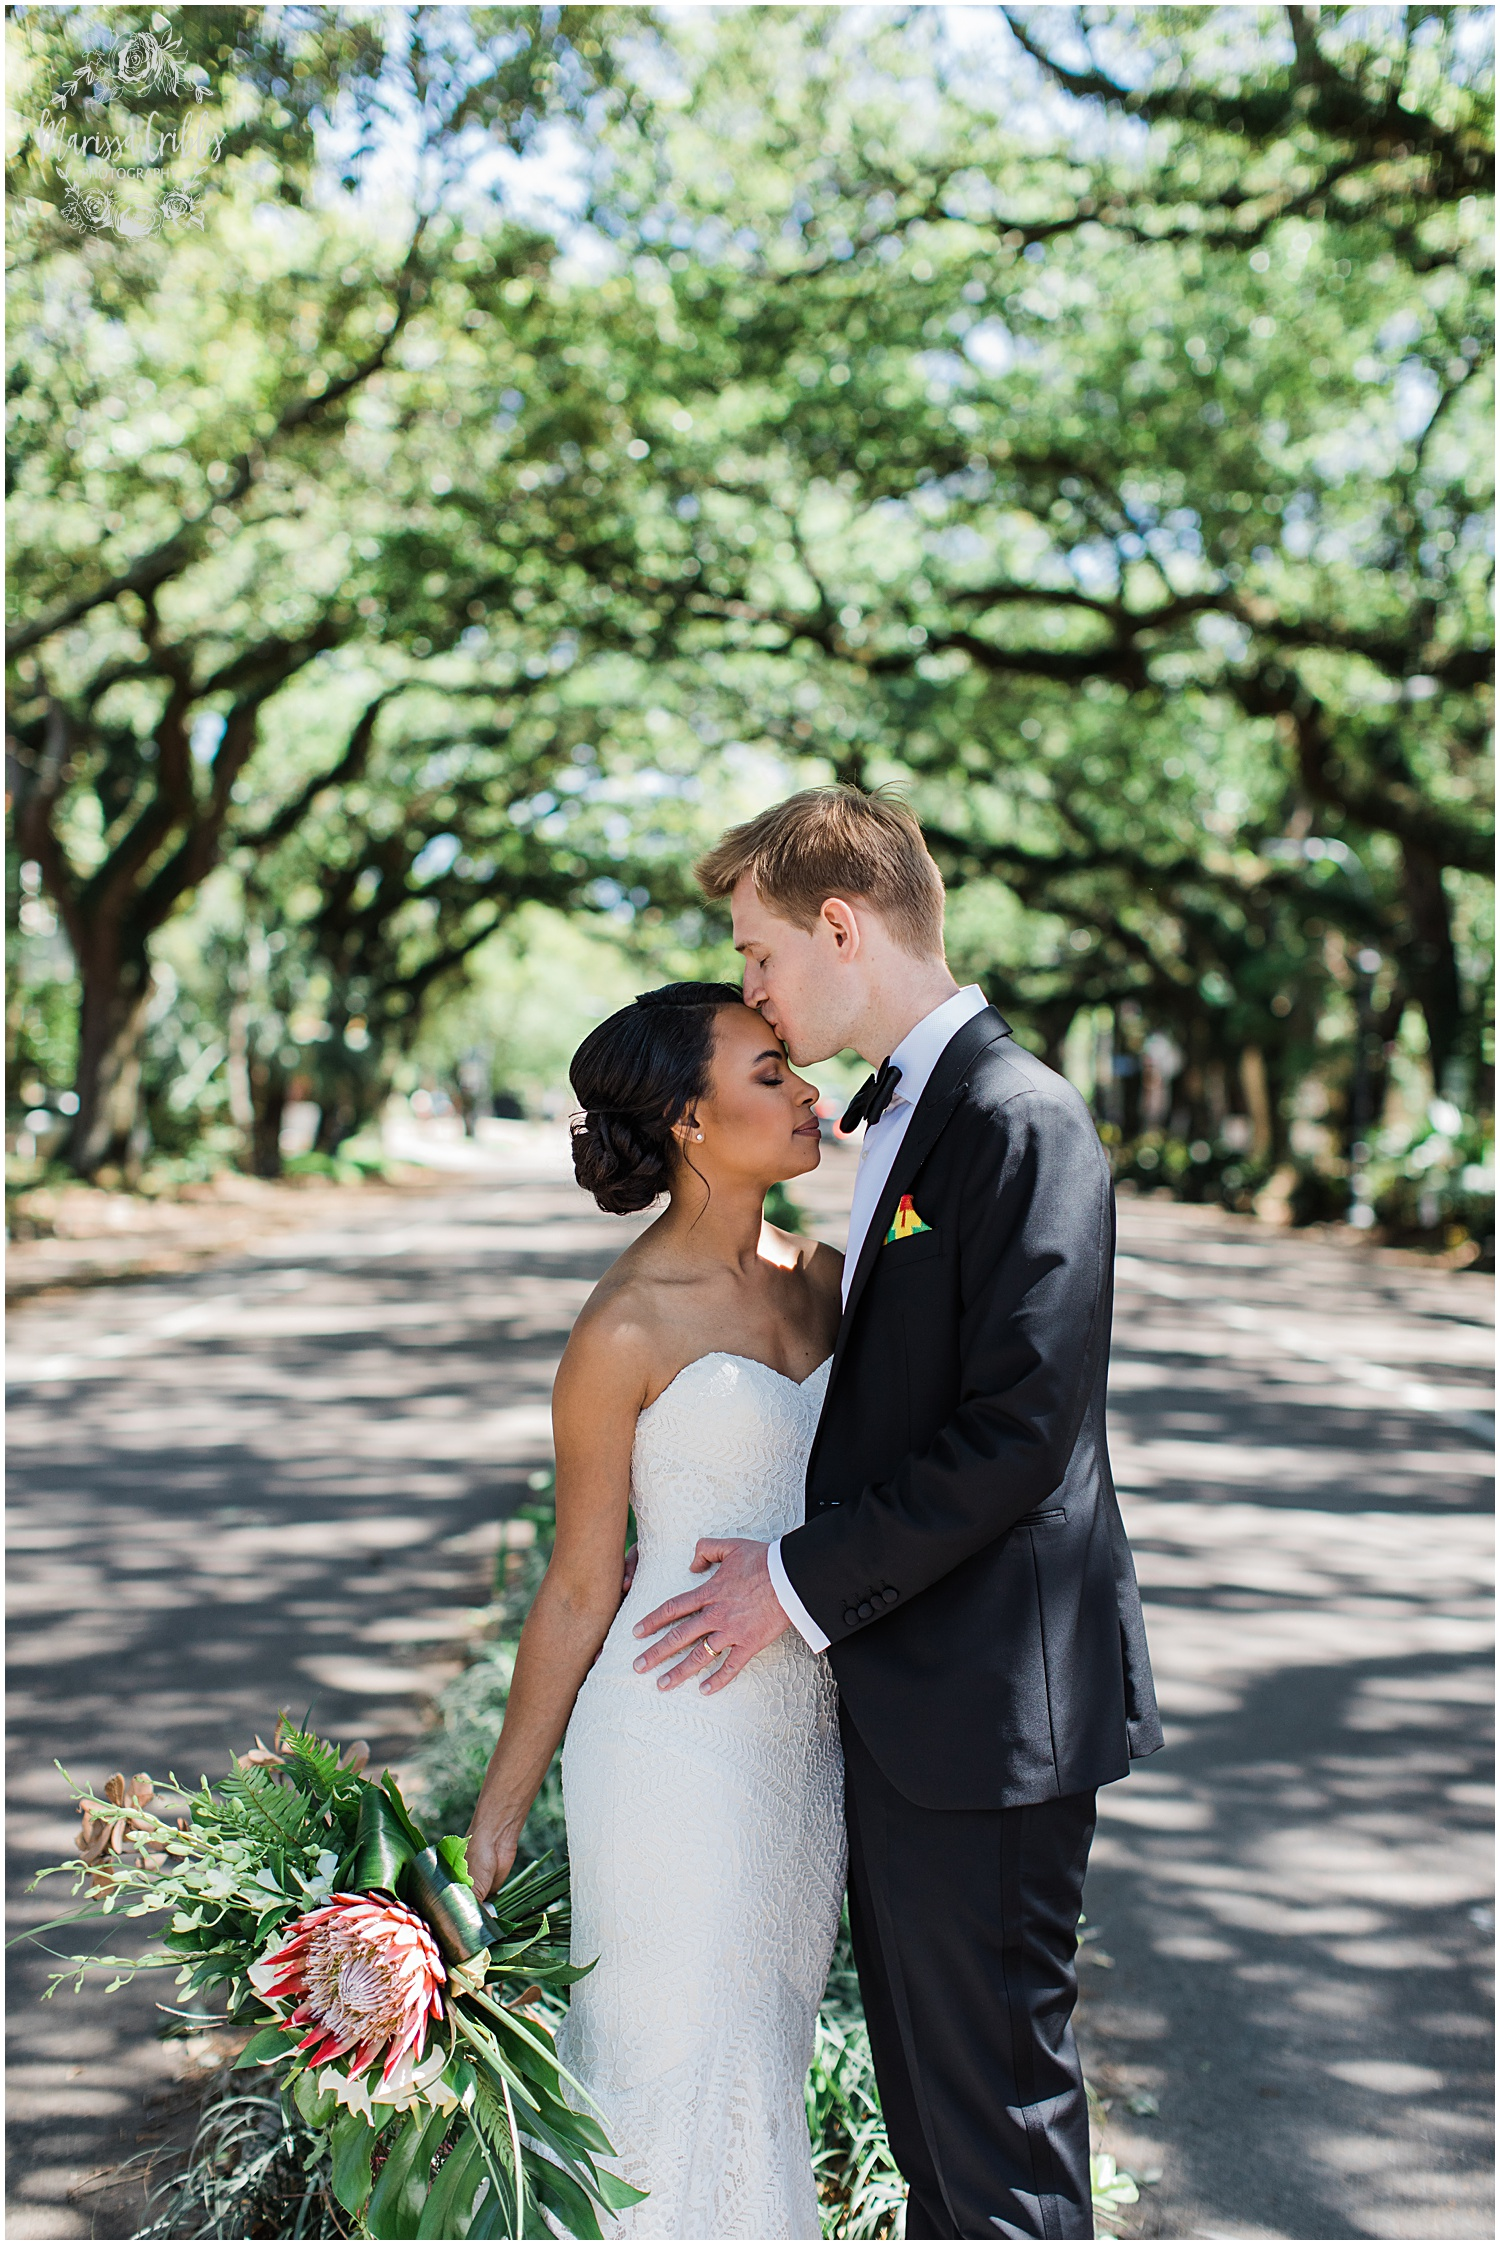 NEW ORLEANS WEDDING   BENACHI HOUSE   SARAH & MICHAEL   MARISSA CRIBBS PHOTOGRAPHY_4424.jpg